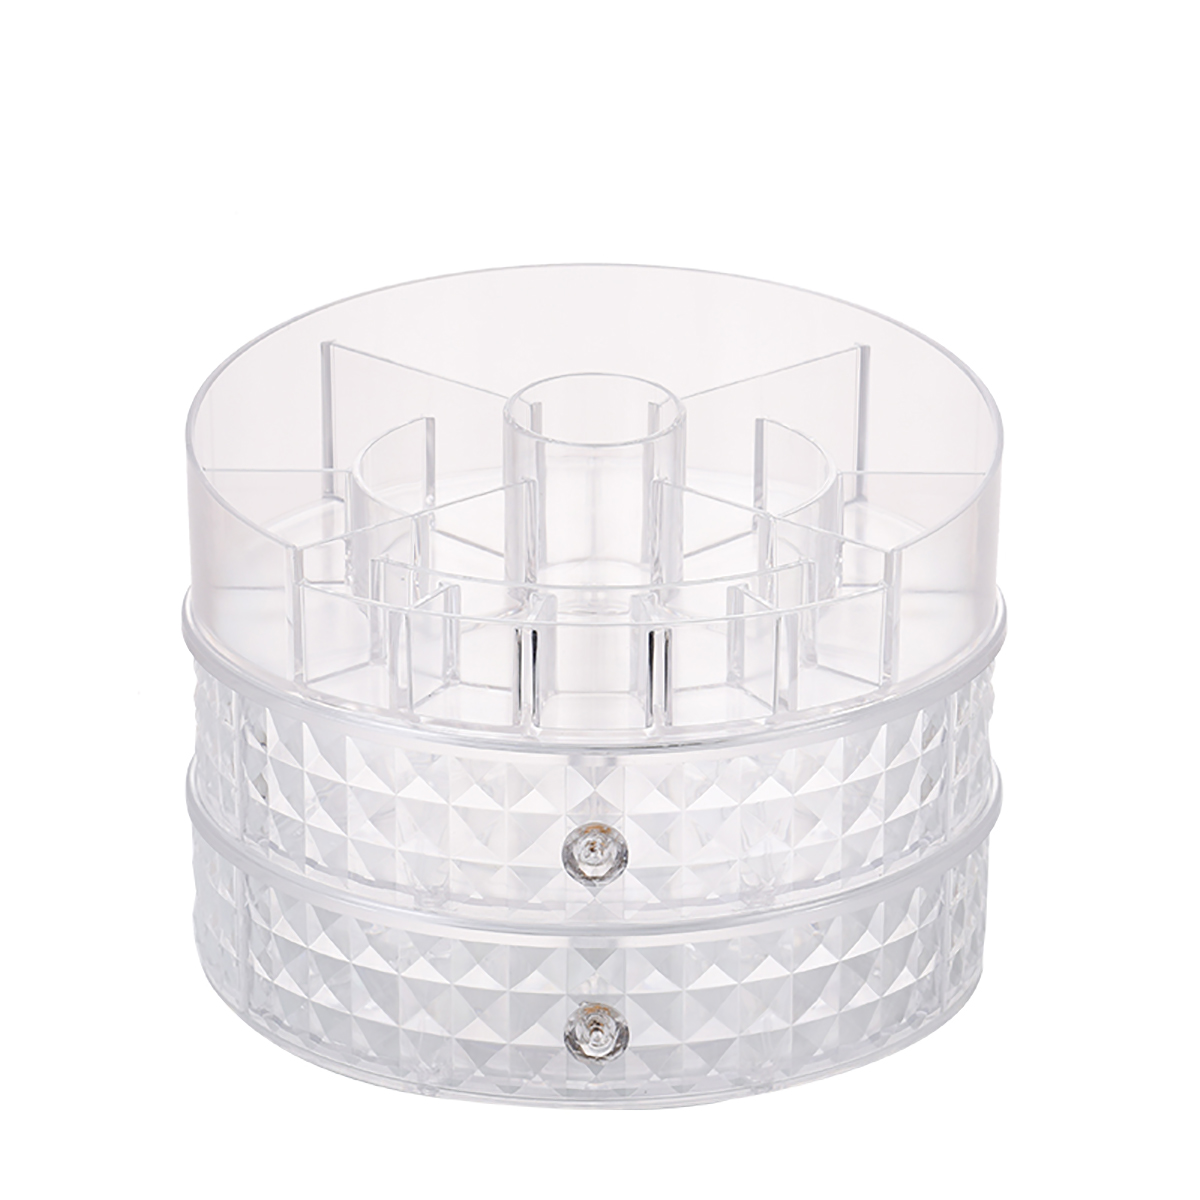 360 Degrees Rotating Cosmetic Storage Box Desktop Home Skin Care Organizer Storage Rack Dressing Table 1 / 2 Layers